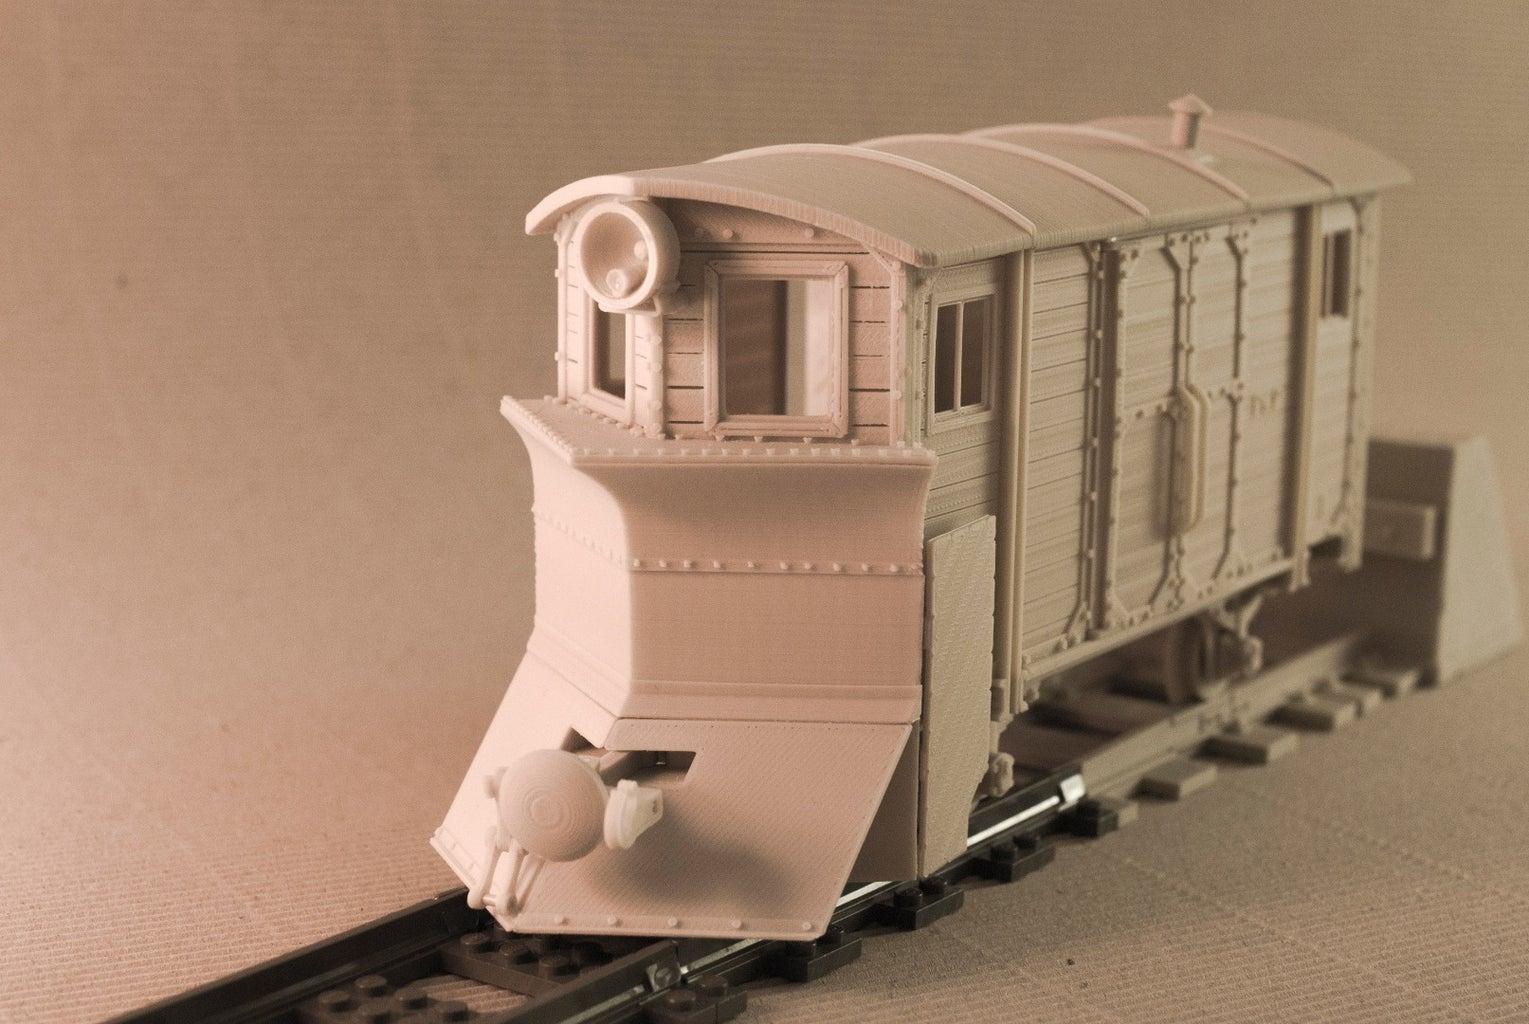 Model Railroad Collection - Radio Controlled (garden Railway?) - 100% 3D-printable, LEGO Connectable